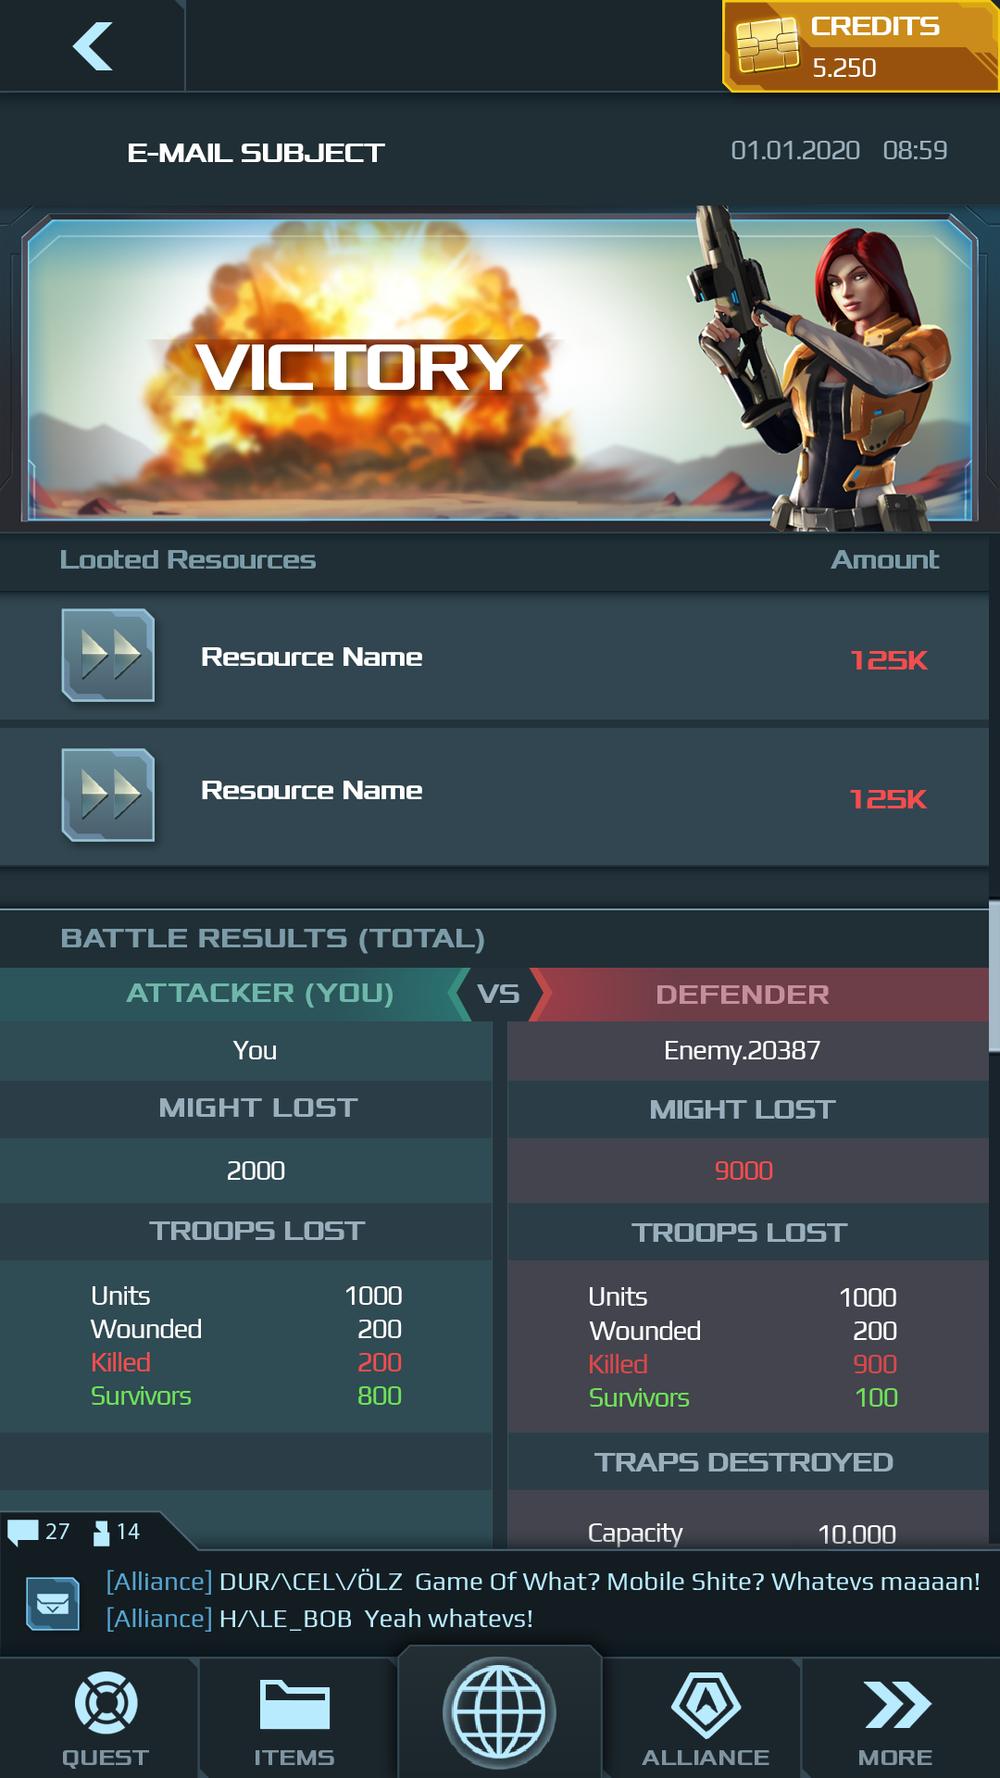 BattleReportMail_01.png